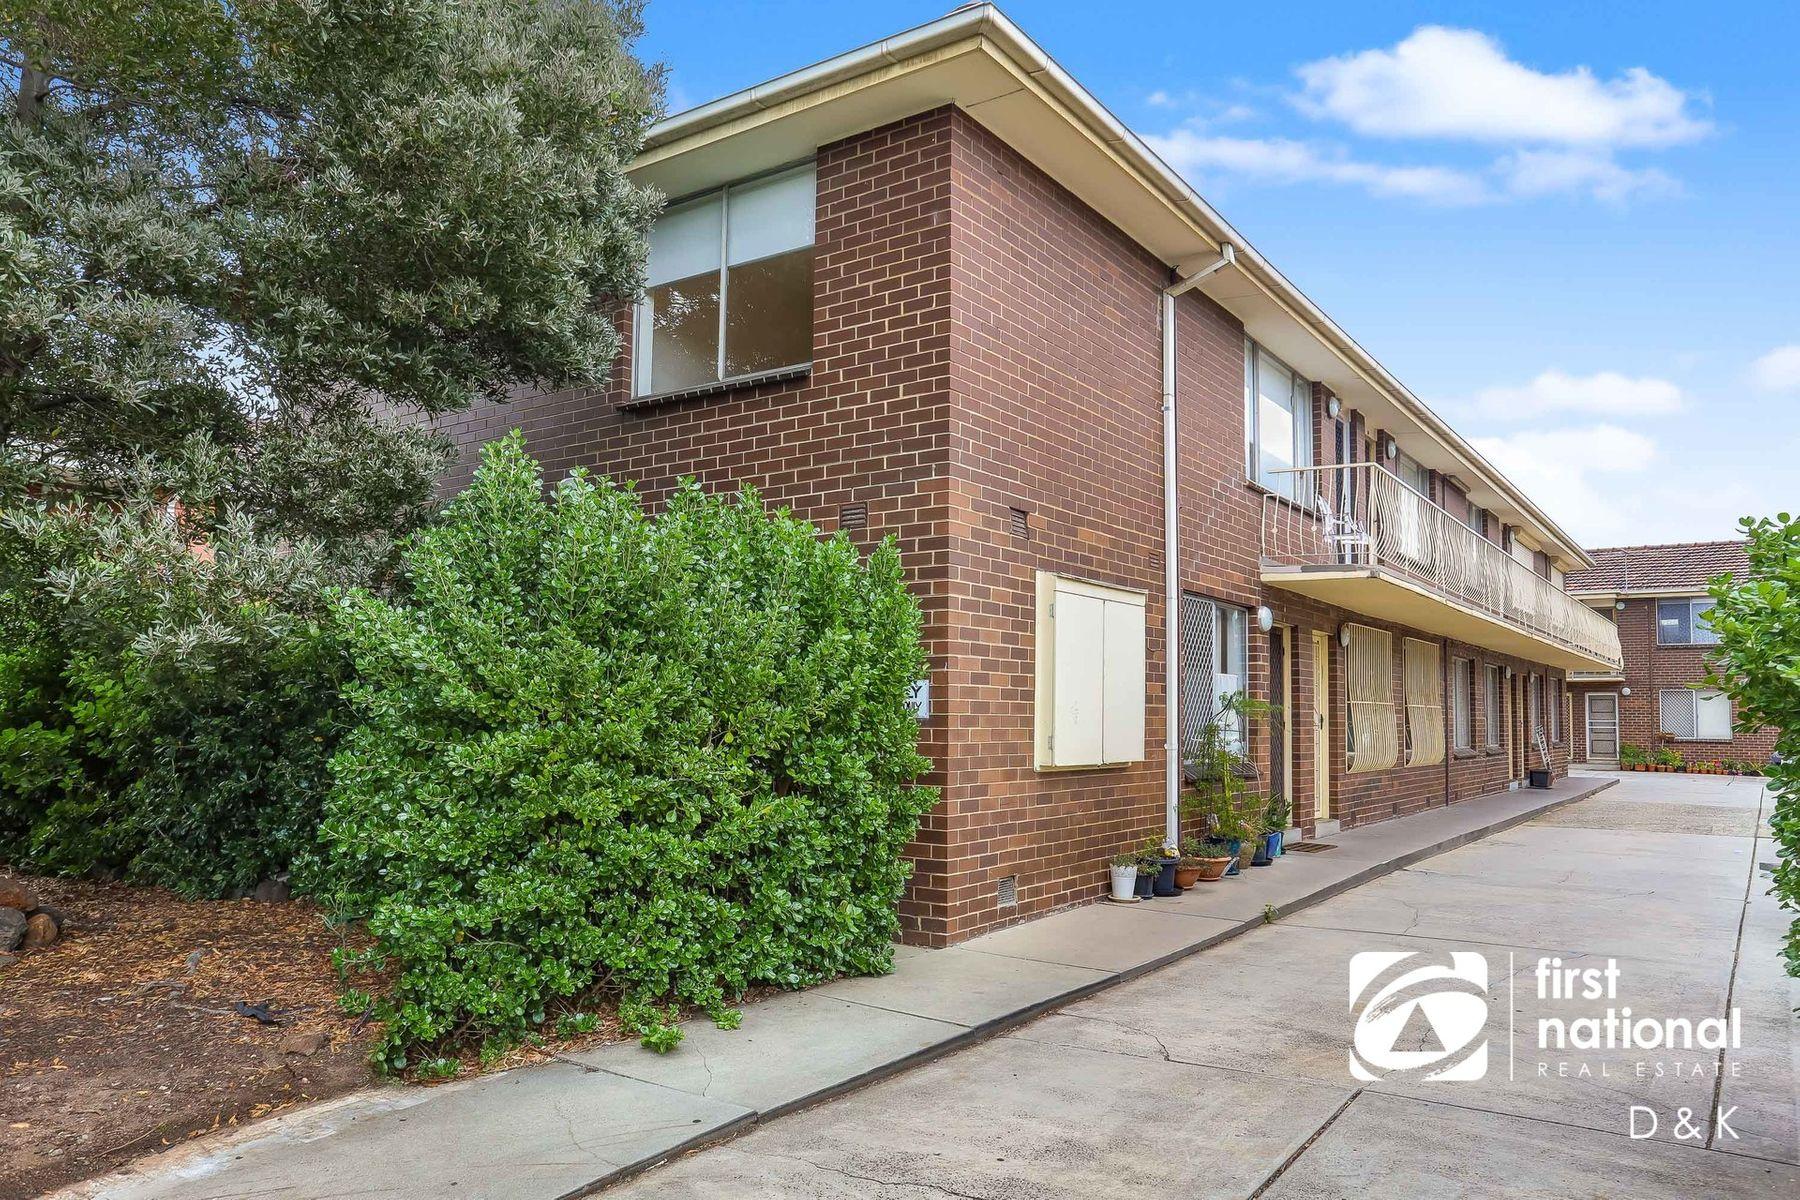 11/29 Eldridge Street, Footscray, VIC 3011